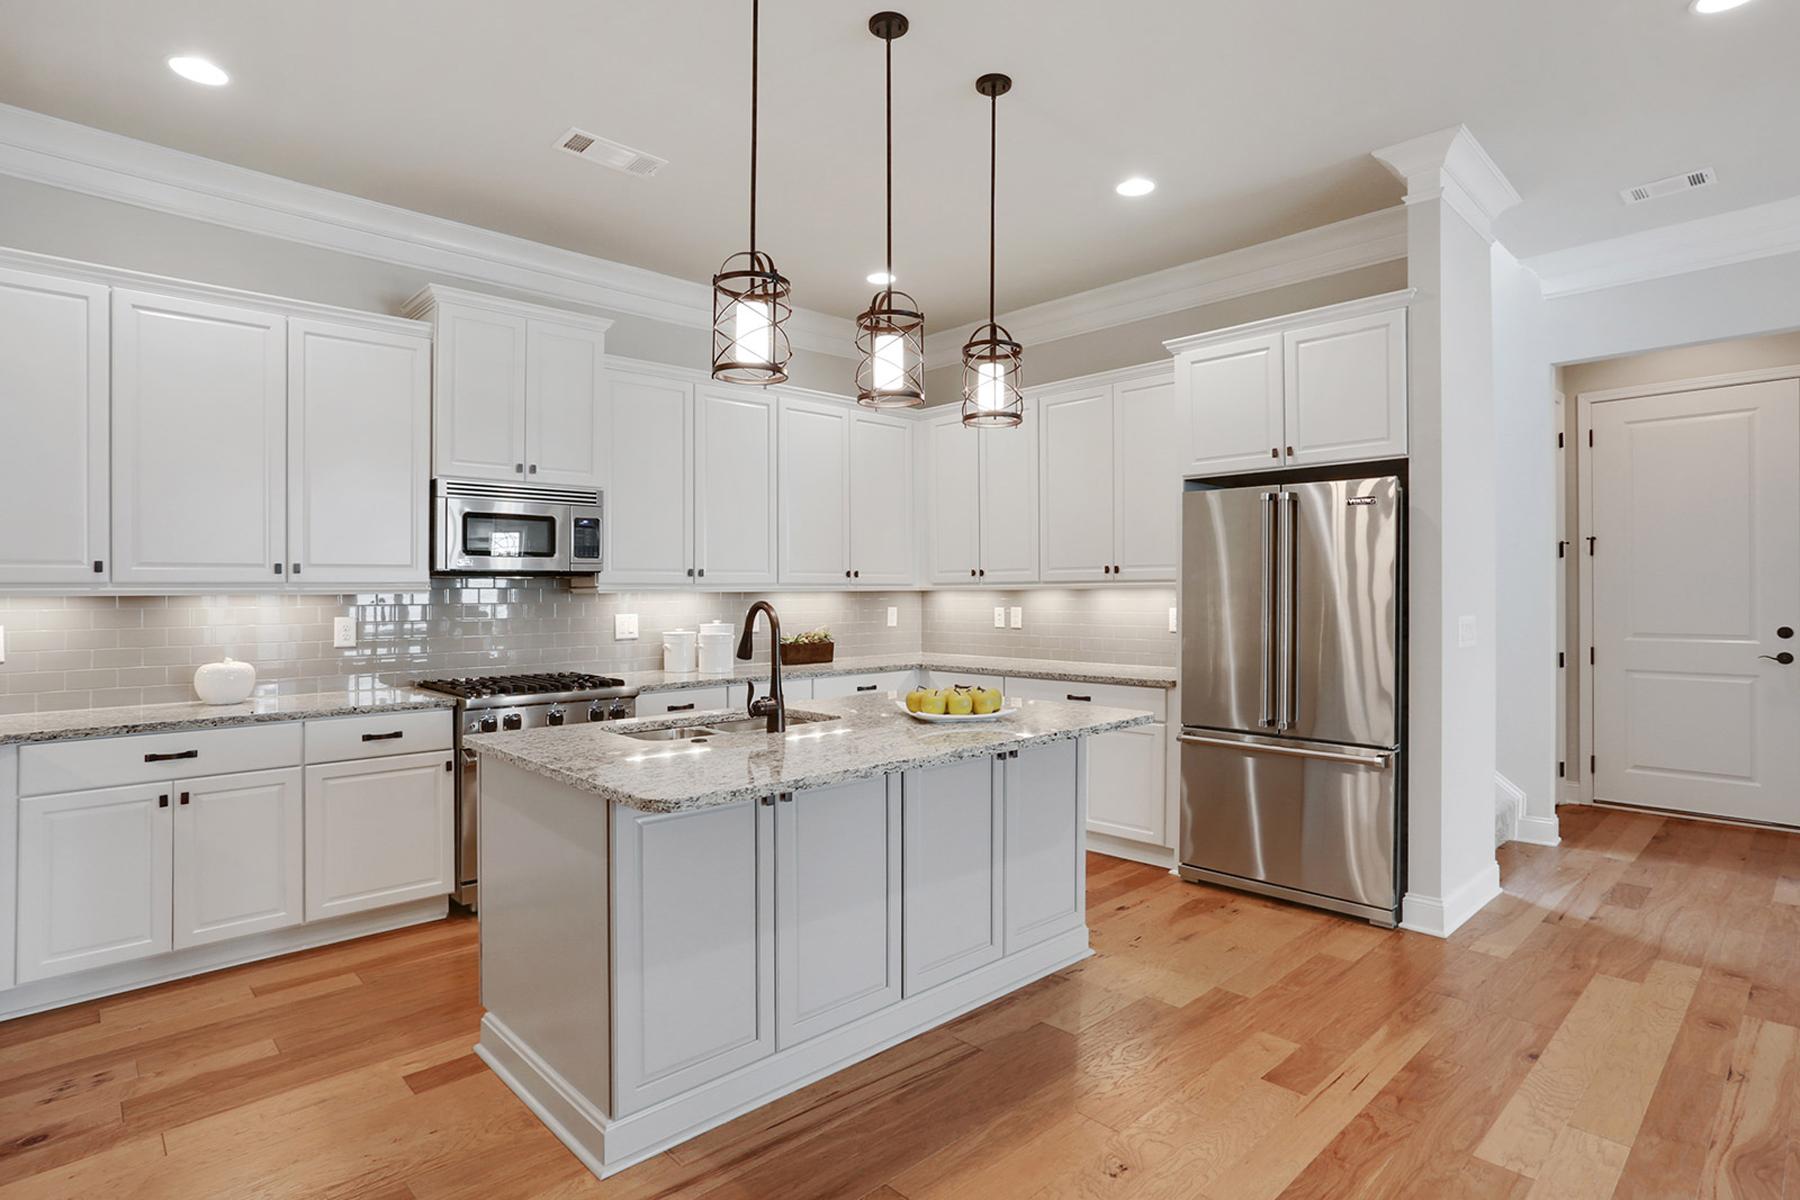 Additional photo for property listing at Luxury Maintenance Free Living 317 Little Pine Lane Woodstock, Georgia 30188 United States